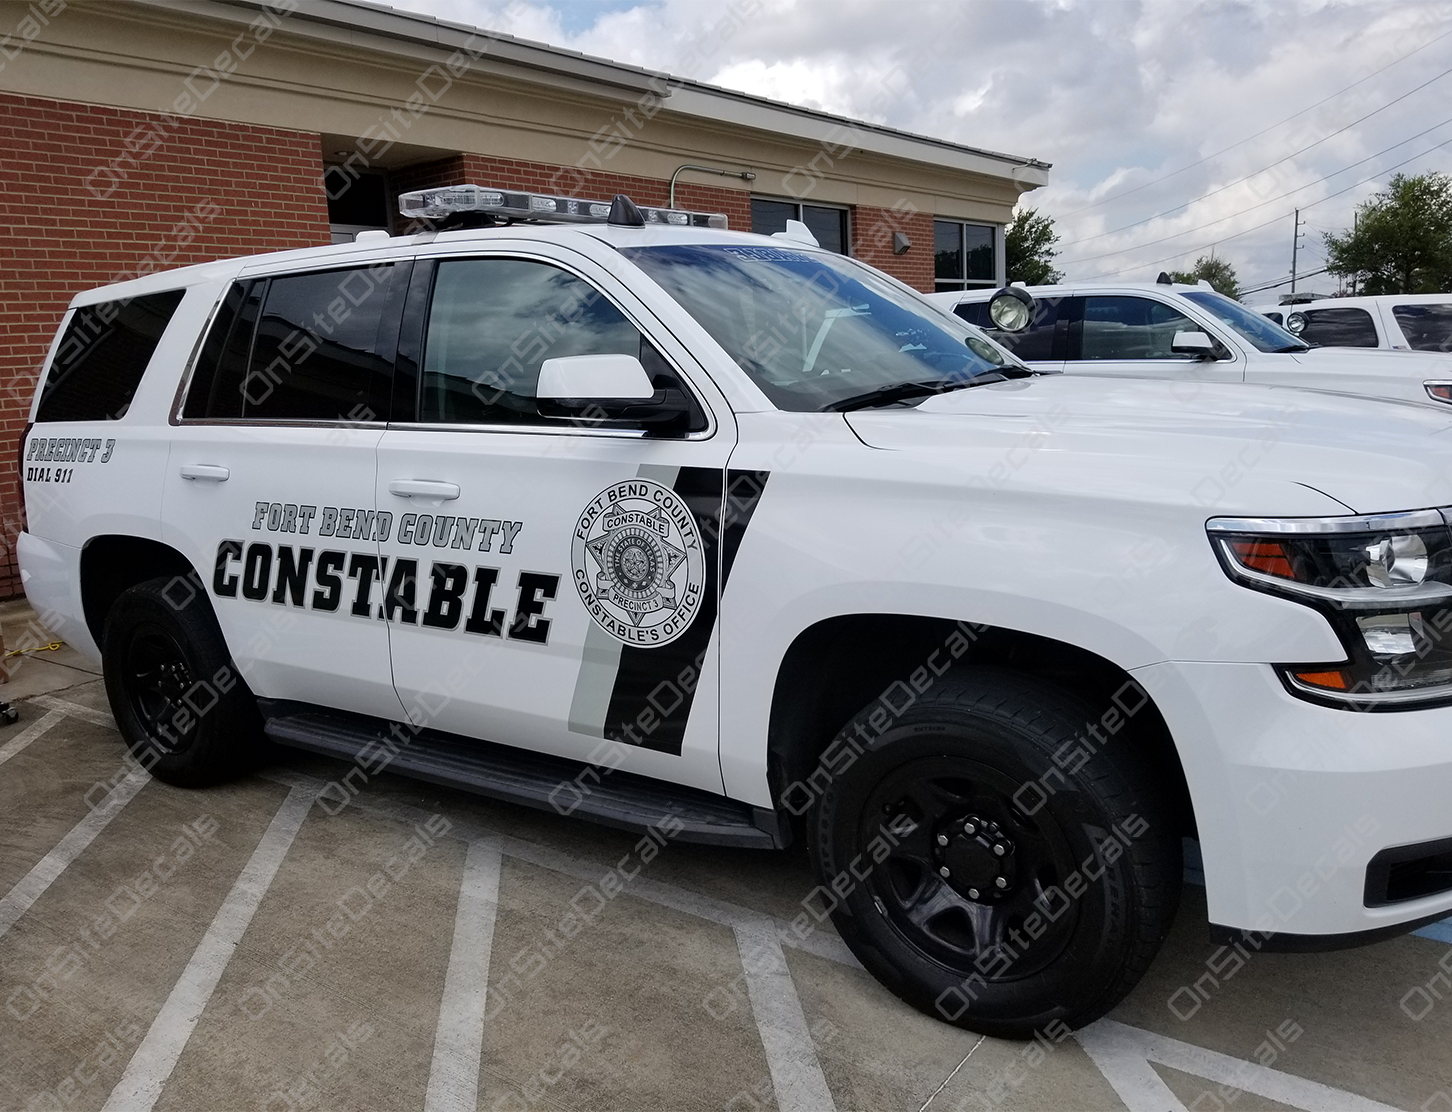 fbc-constable-pct-3.png